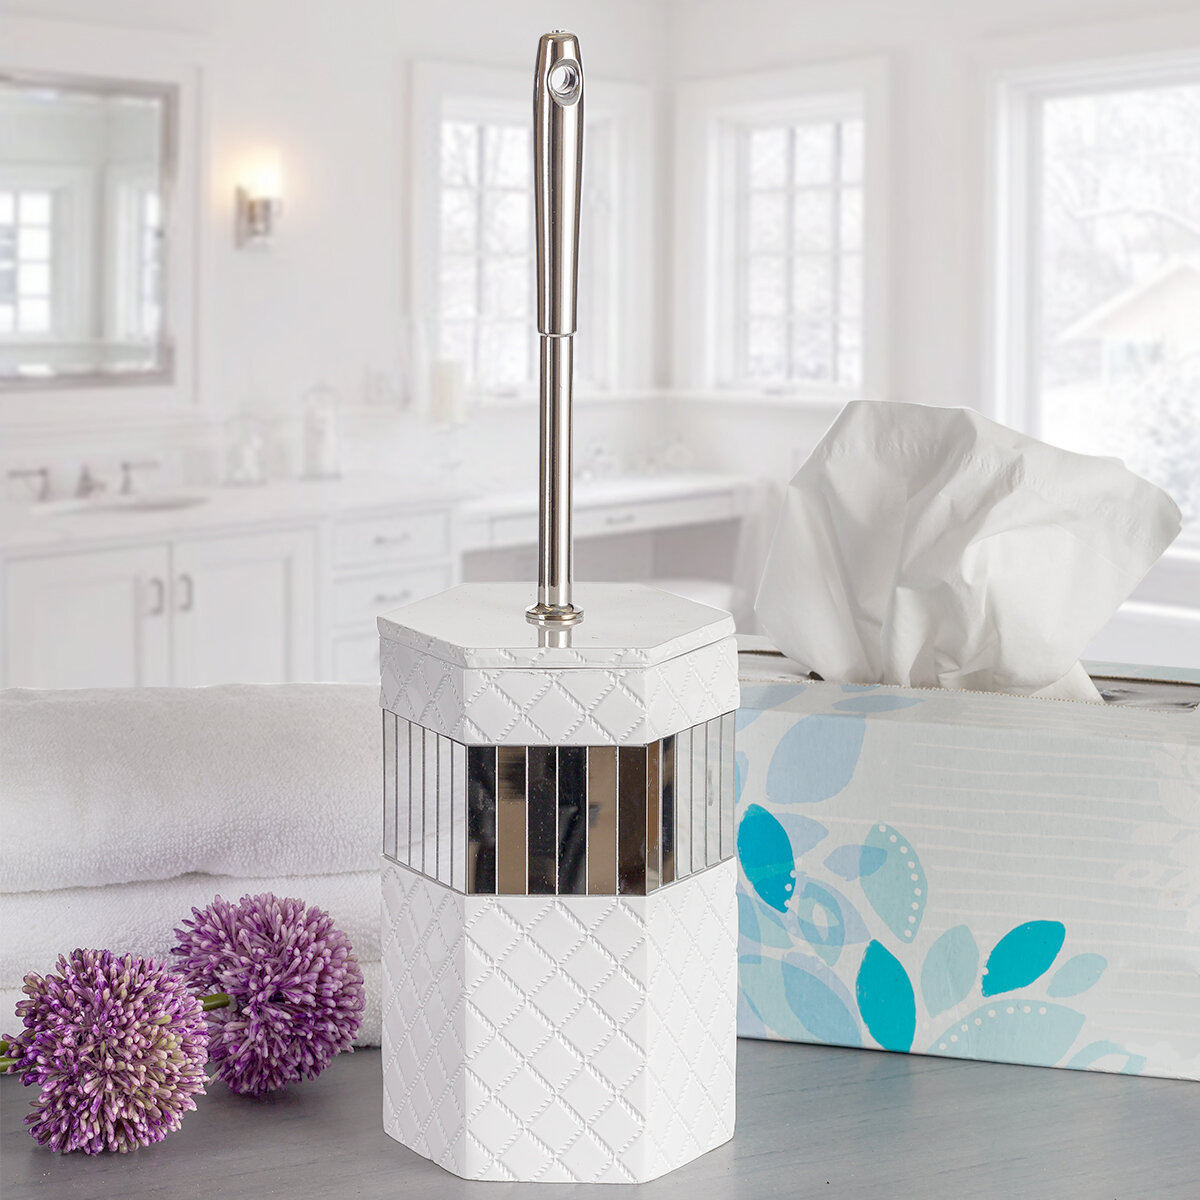 Orren Ellis Quilted Mirror 14in H Free Standing Toilet Brush And Holder Reviews Wayfair